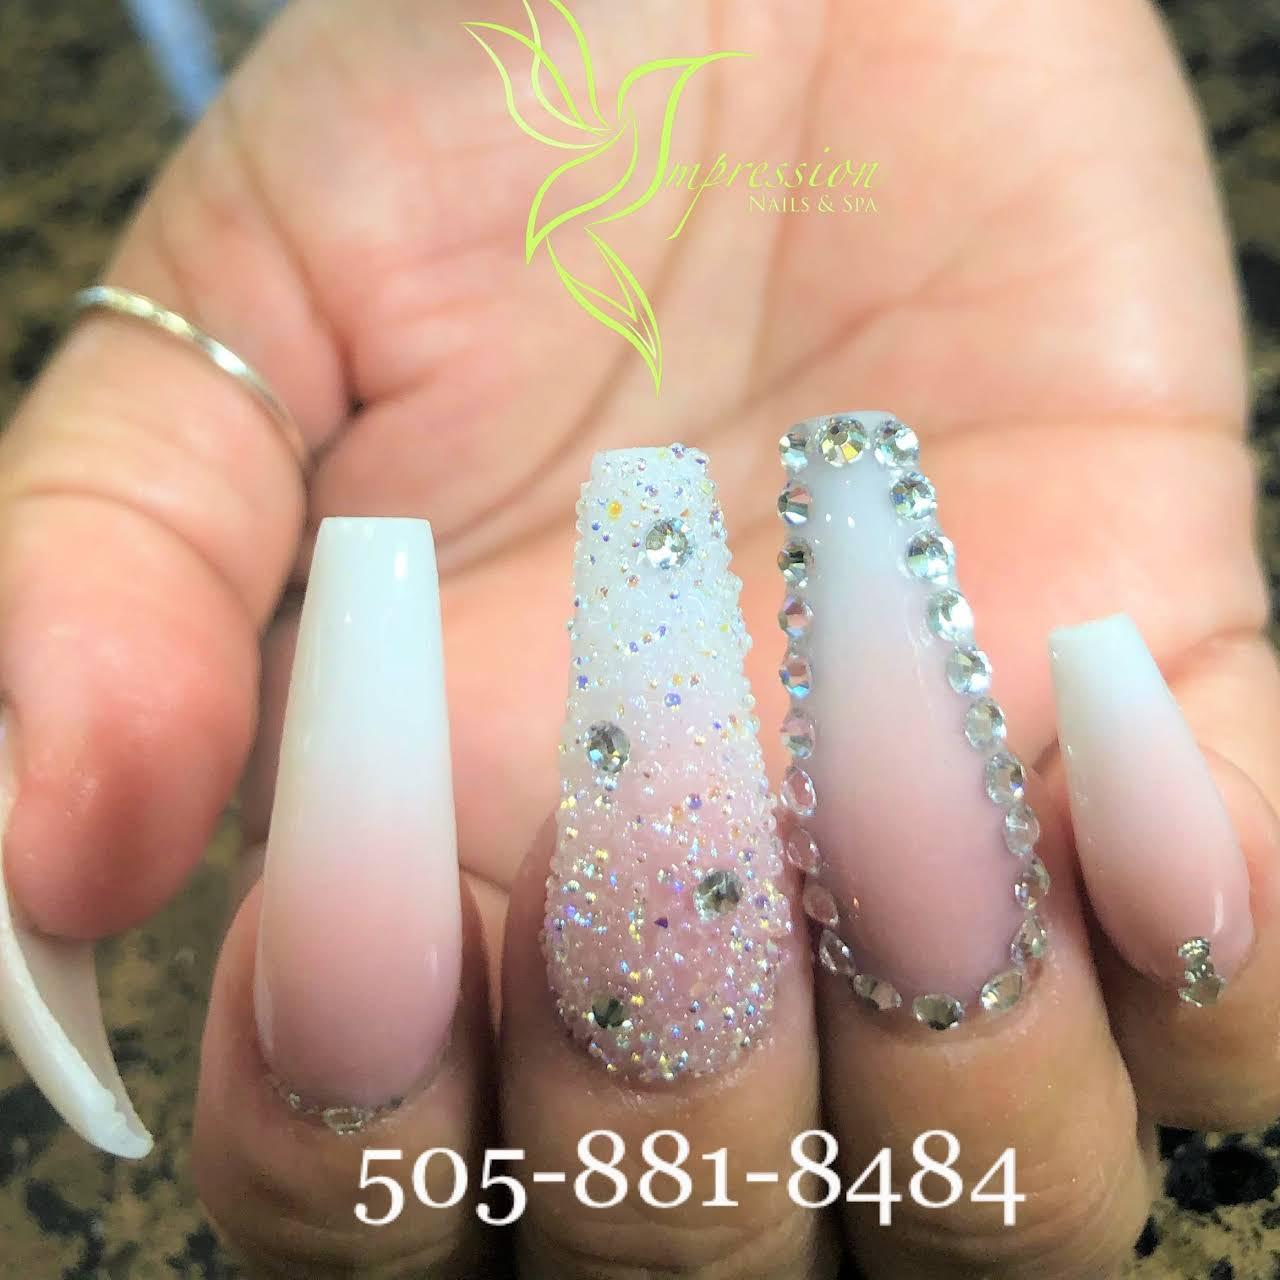 Impression Nails Spa - Top Quality Nails Salon in Albuquerque